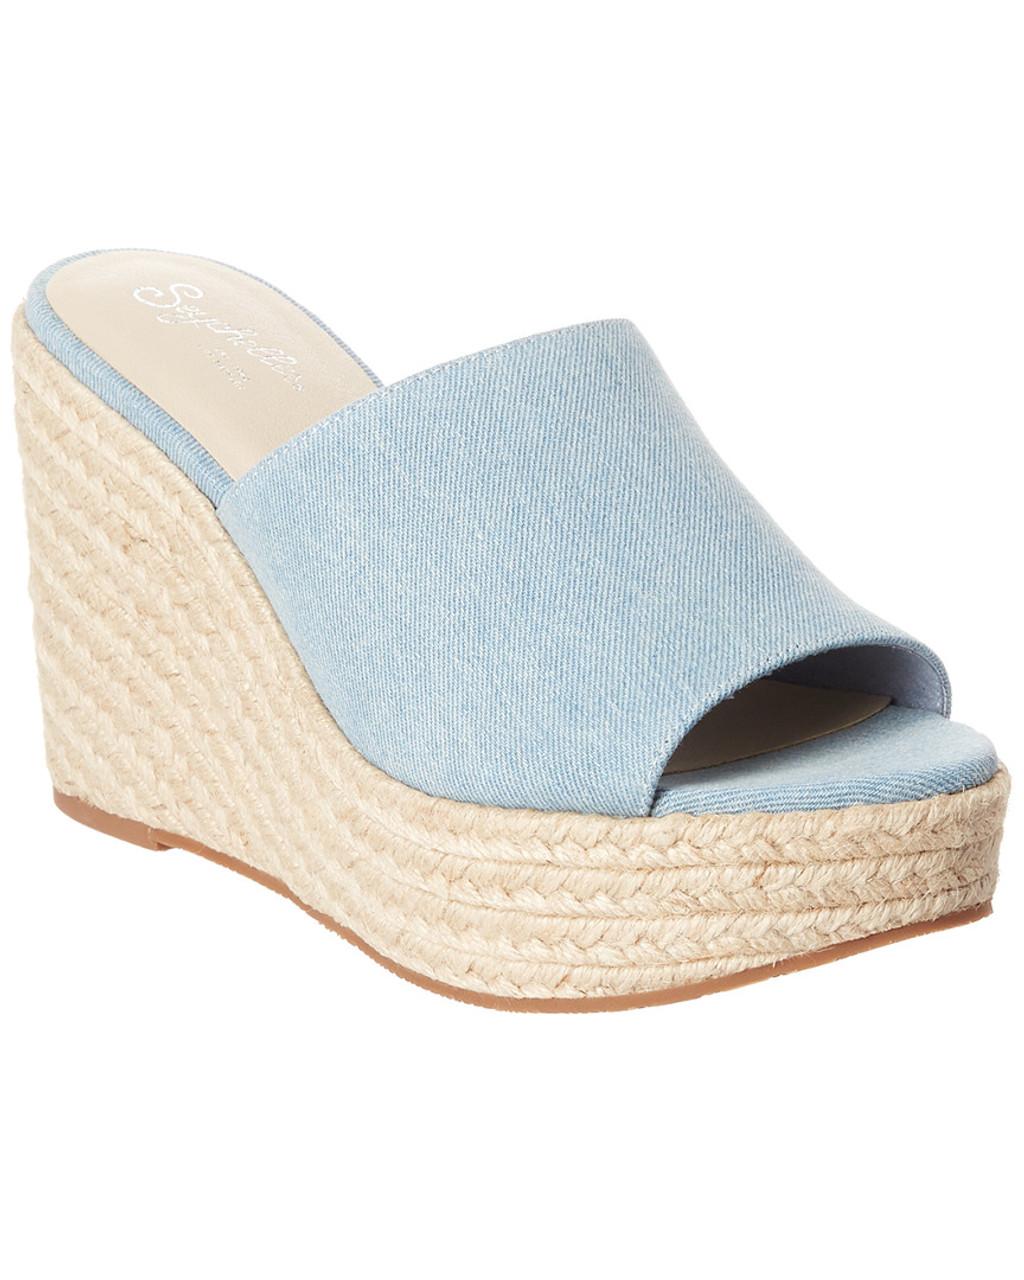 bf6d8130c8 Seychelles Ride The Wave Denim Wedge Sandal~1311946846 - Boston Store